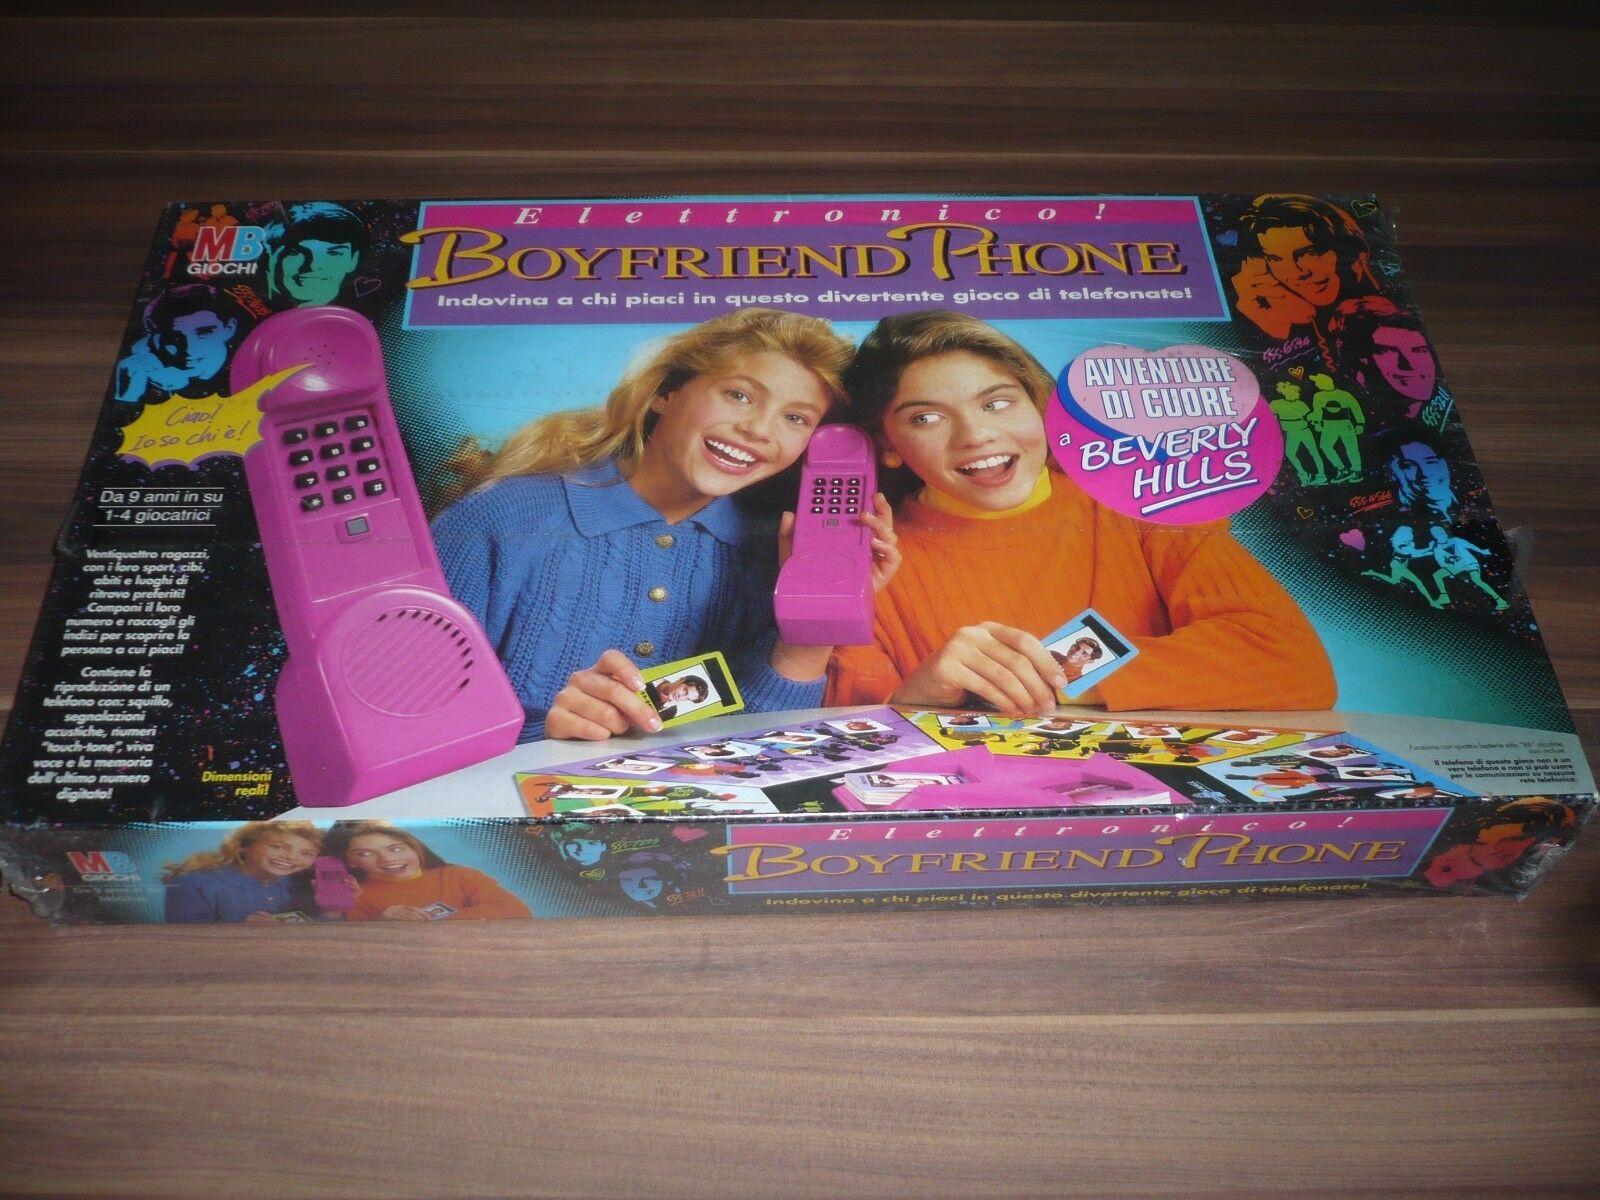 NEU NEU Traumtelefon (ITALIENISCH) (ITALIENISCH) (ITALIENISCH) Boyfriend Phone MB-Spiele NEU in FOLIE 31560c